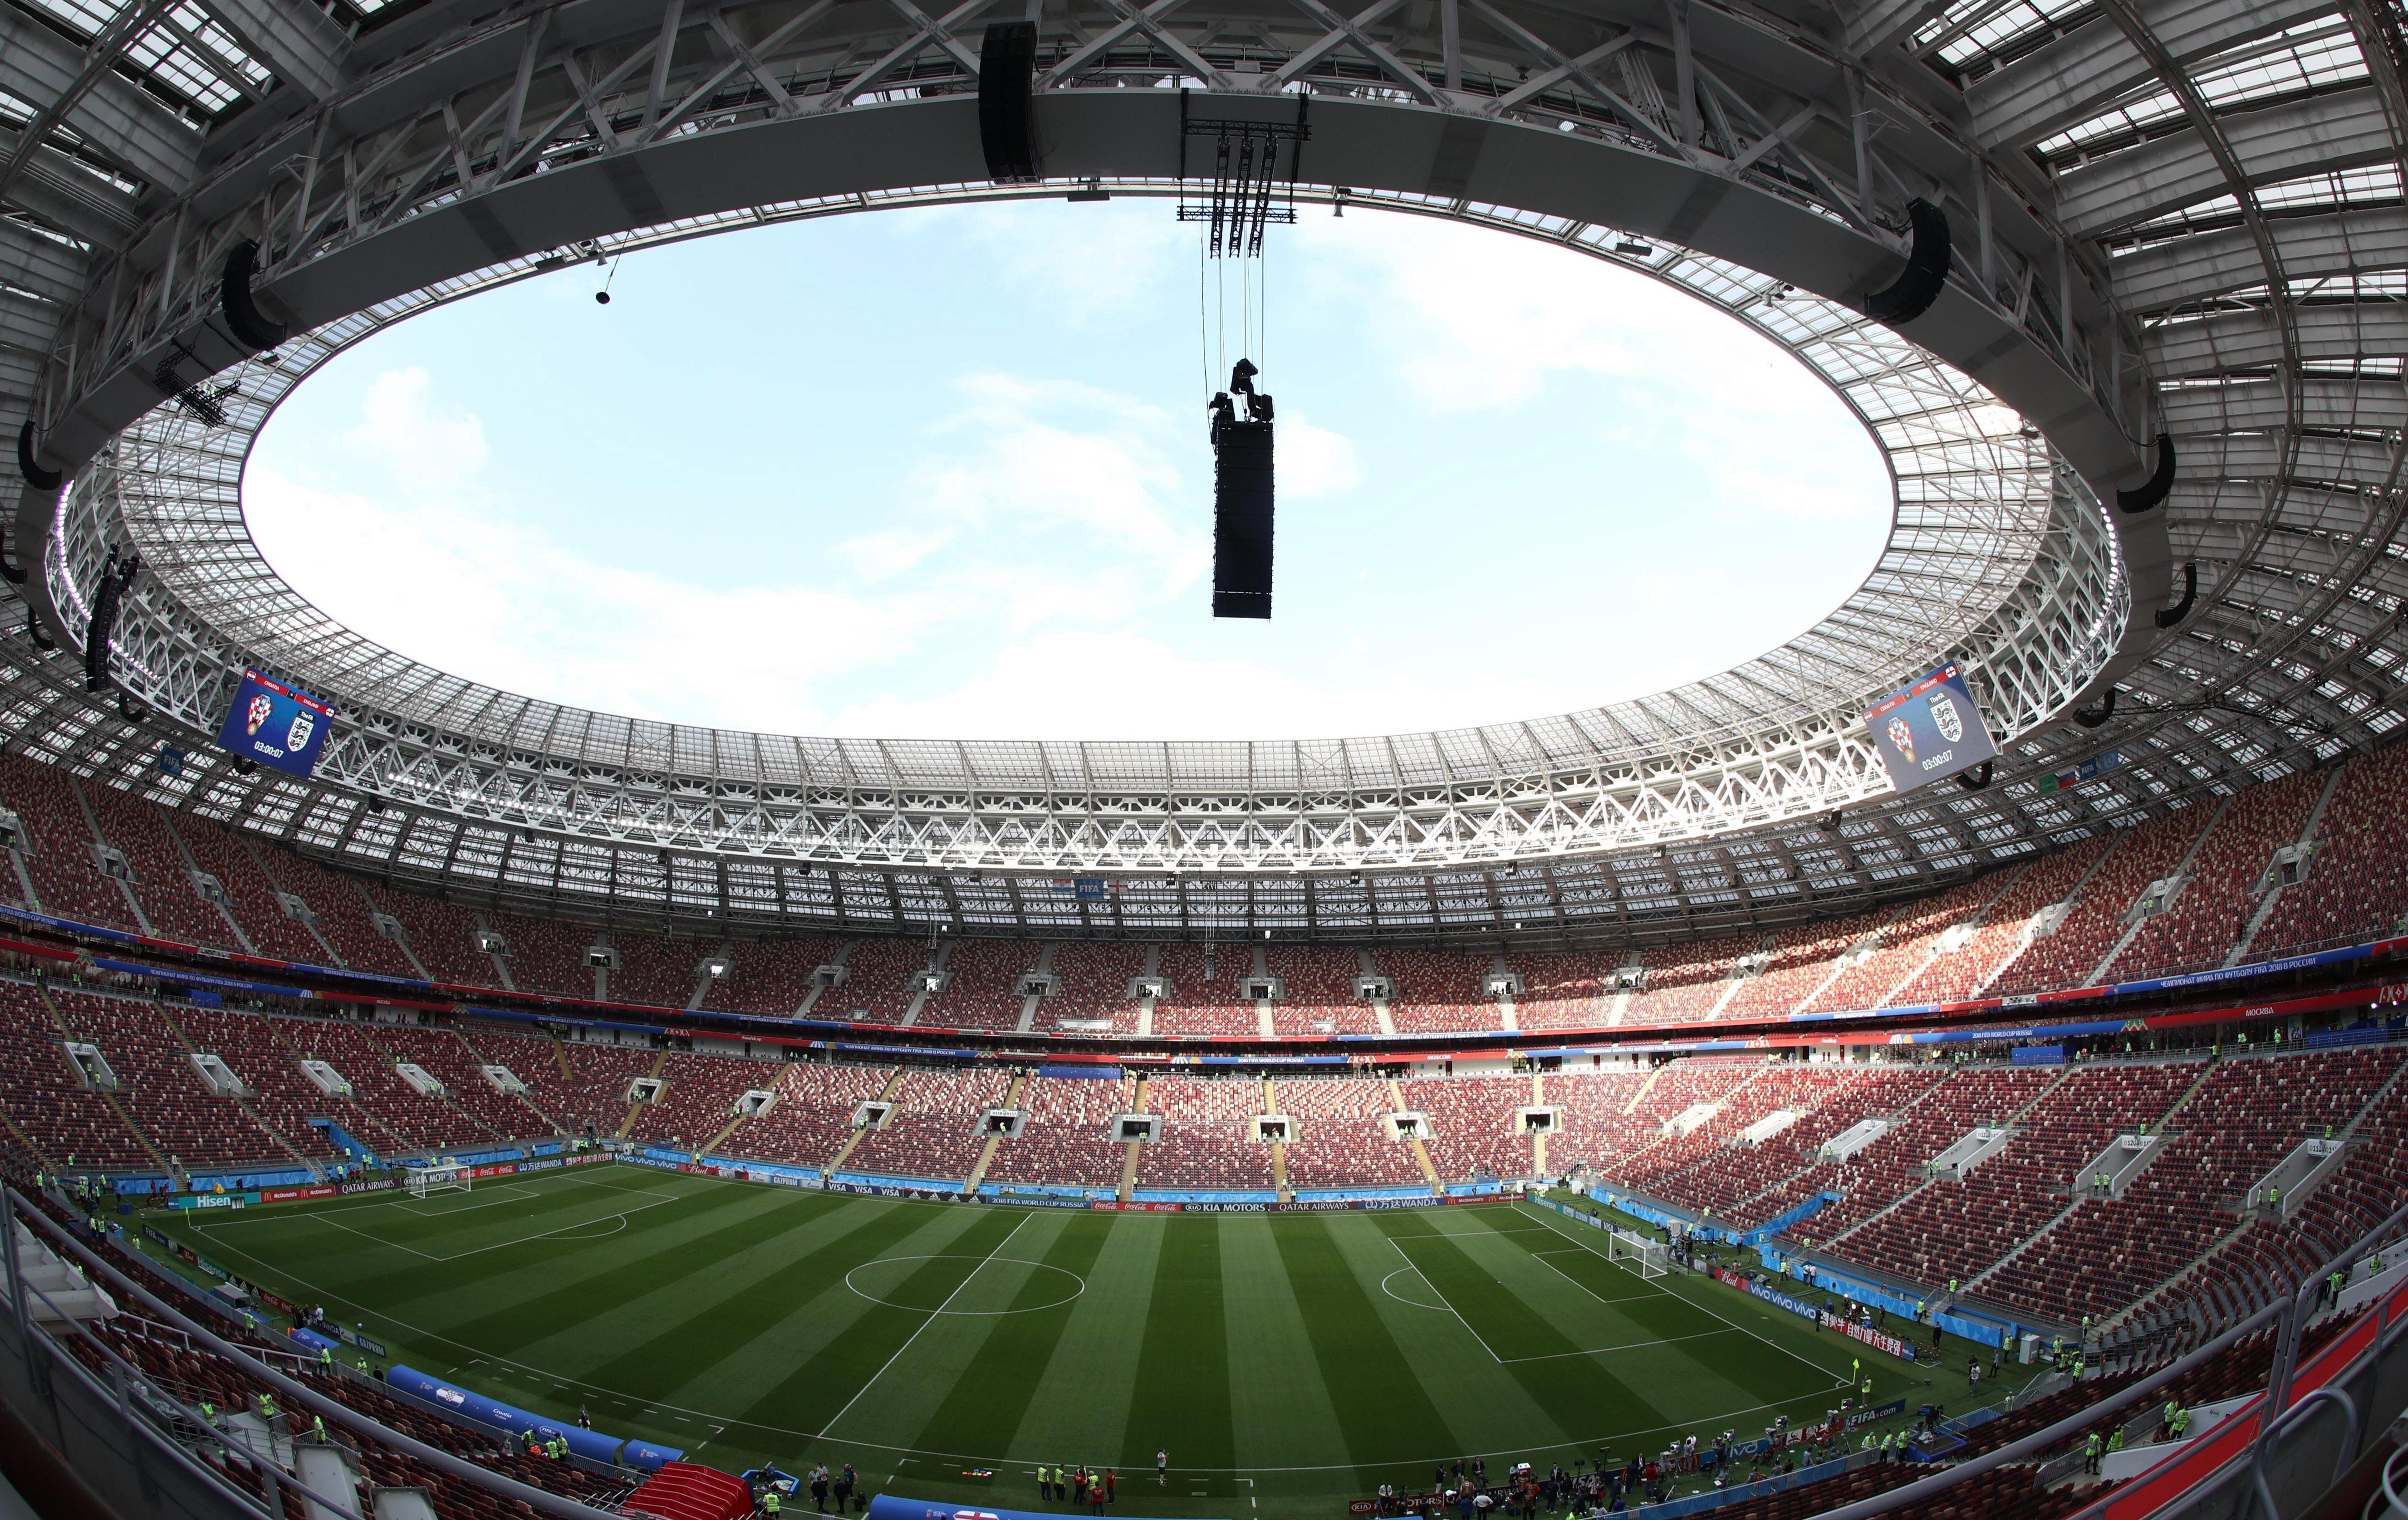 Khabib has revealed plans to fight Mayweather at the Luzhniki Stadium